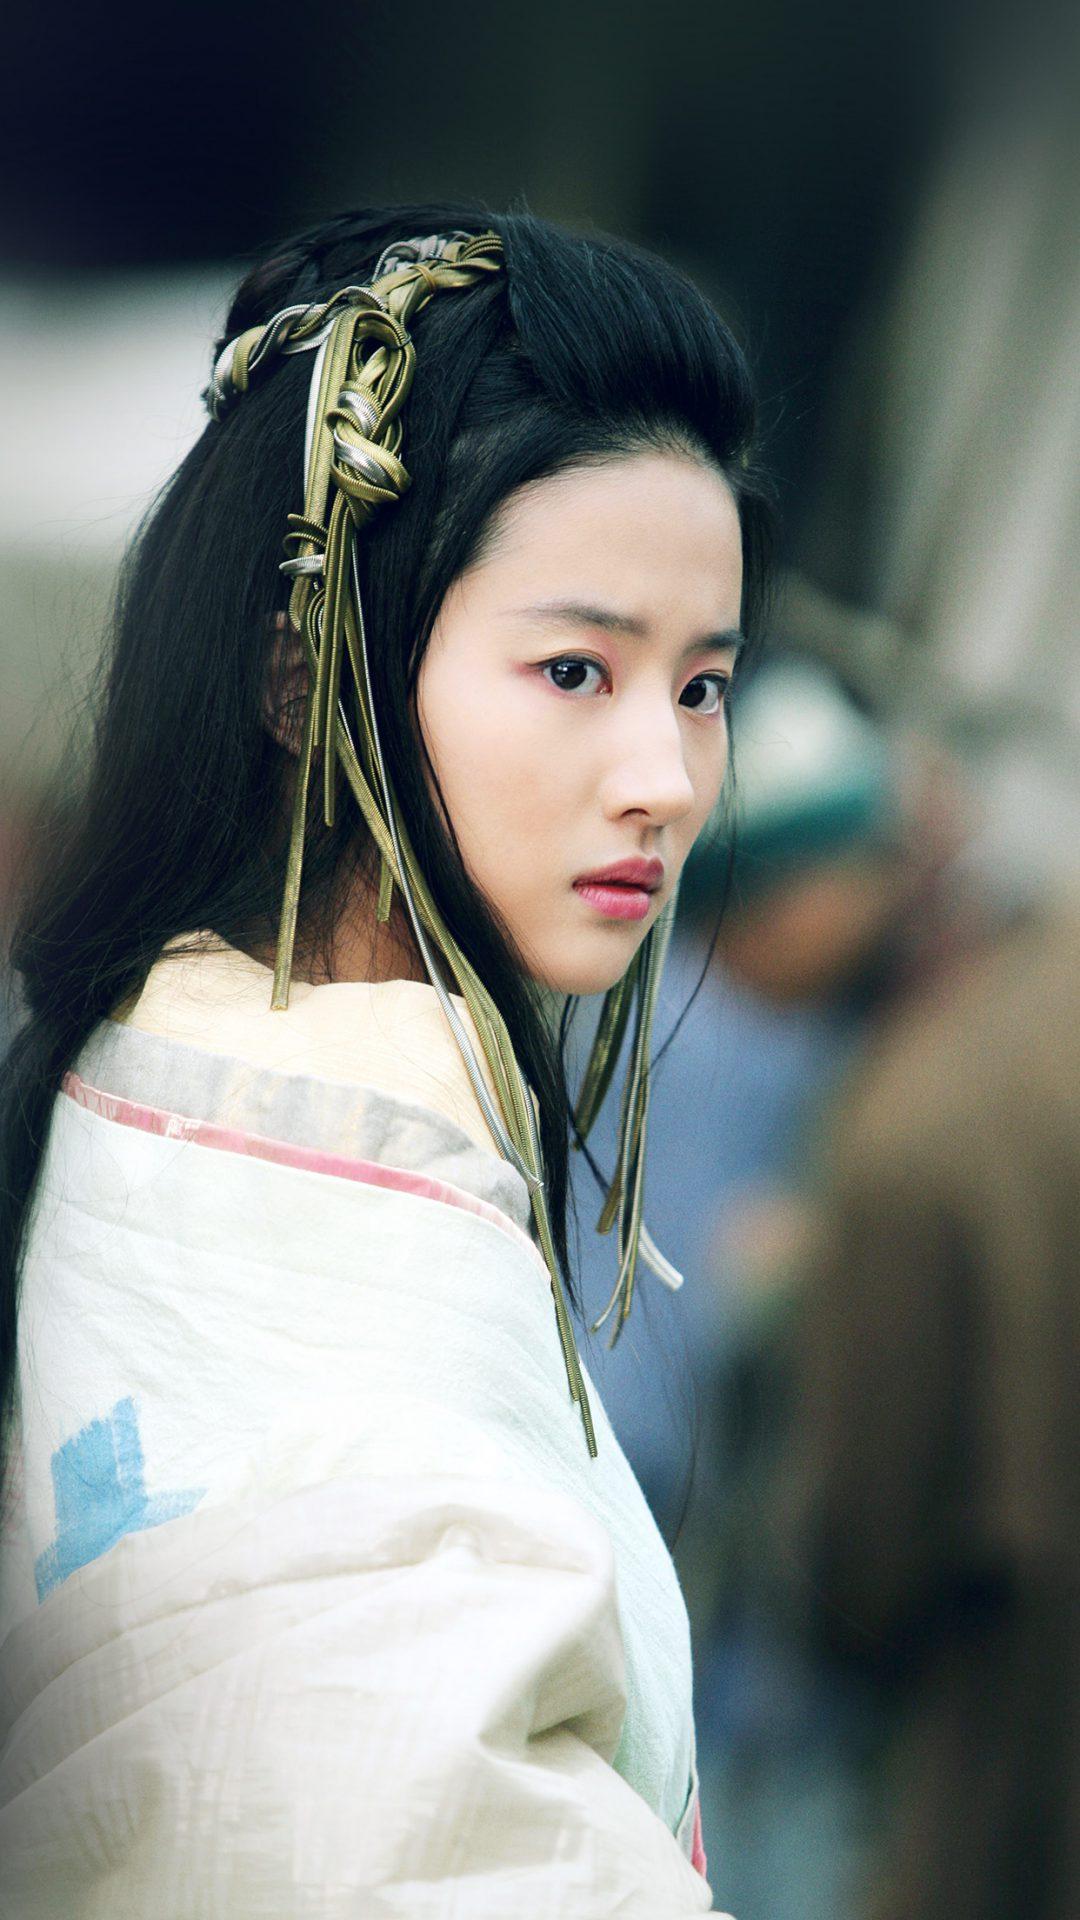 Liu Yifei China Star Film Actress Model Singer